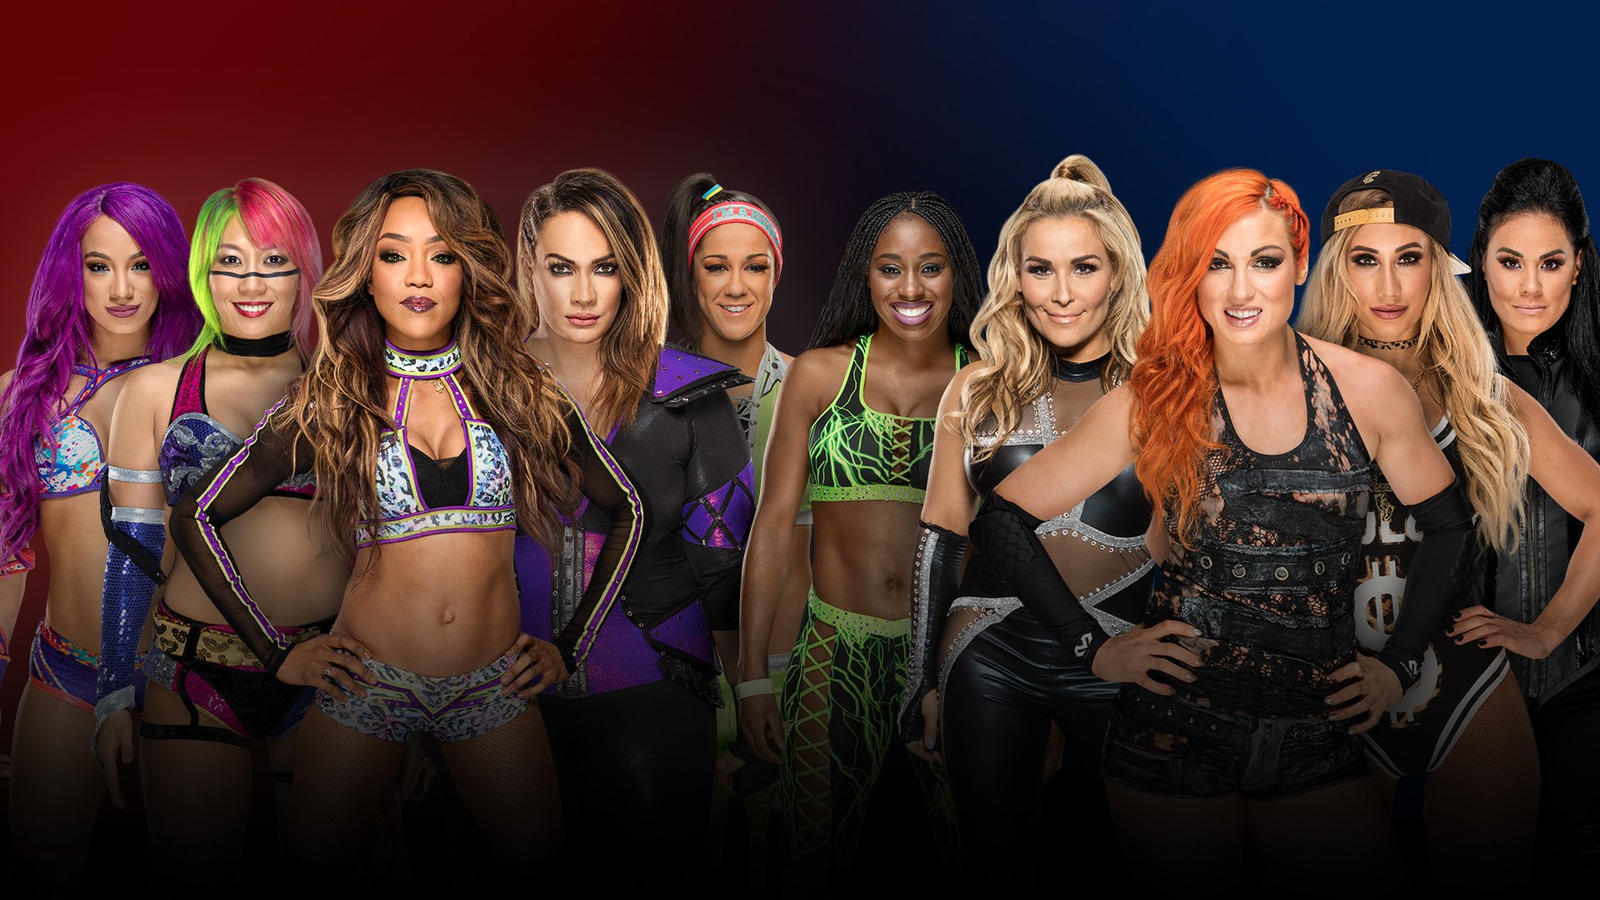 Confirmed & Potential Matches for WWE Survivor Series 2017 20171119_SurvivorSeries_WomensMatch_update--bf49cbcbaac7a00a5f8c469a88ecc510